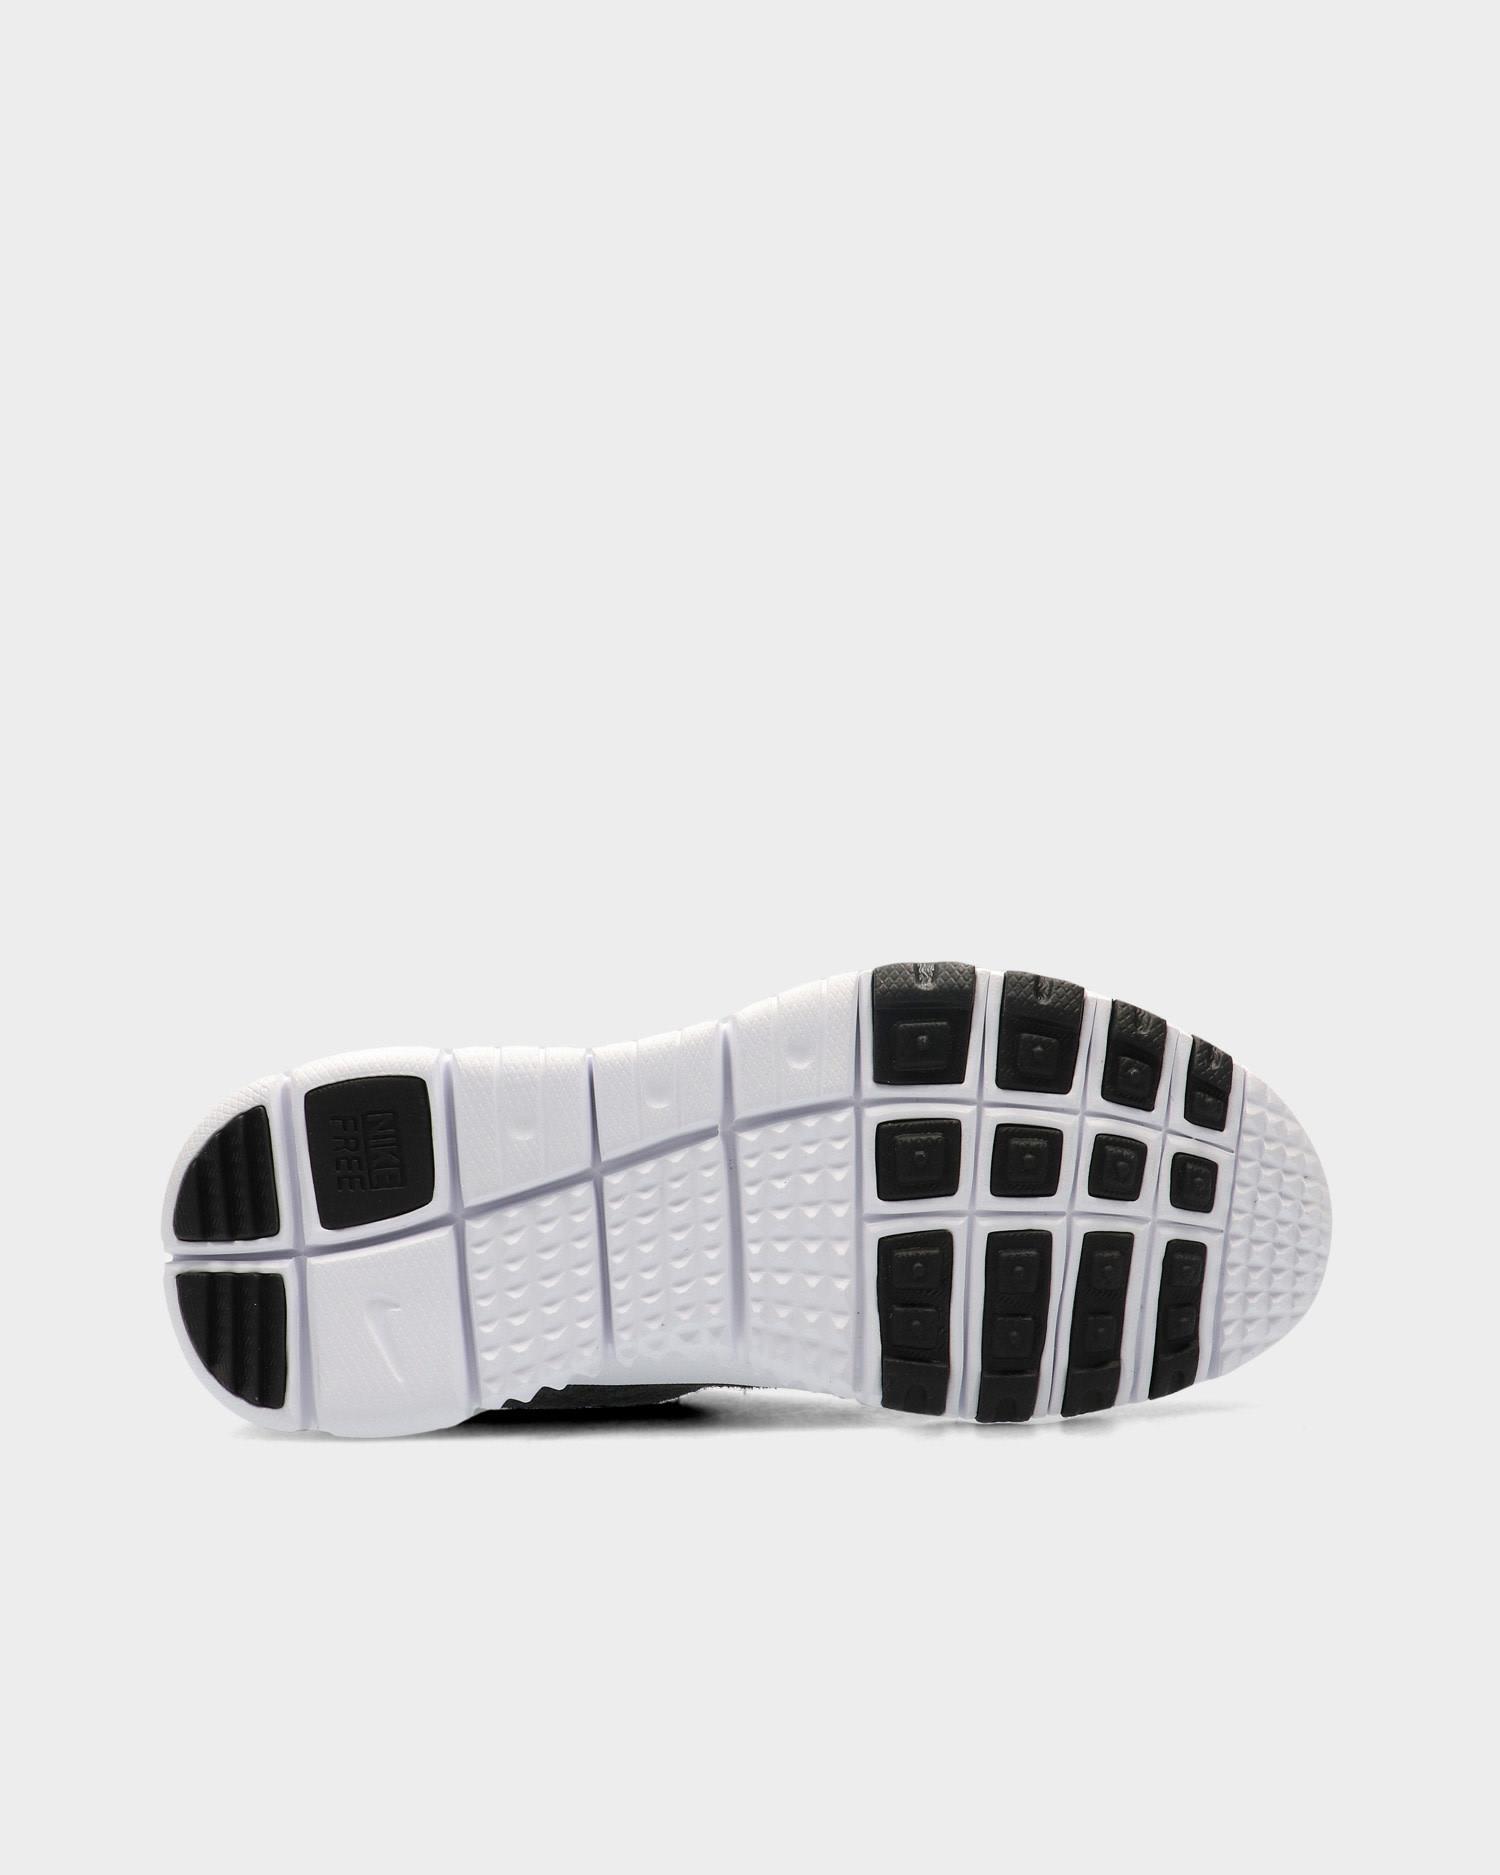 Nike free run trail Black/anthracite-white